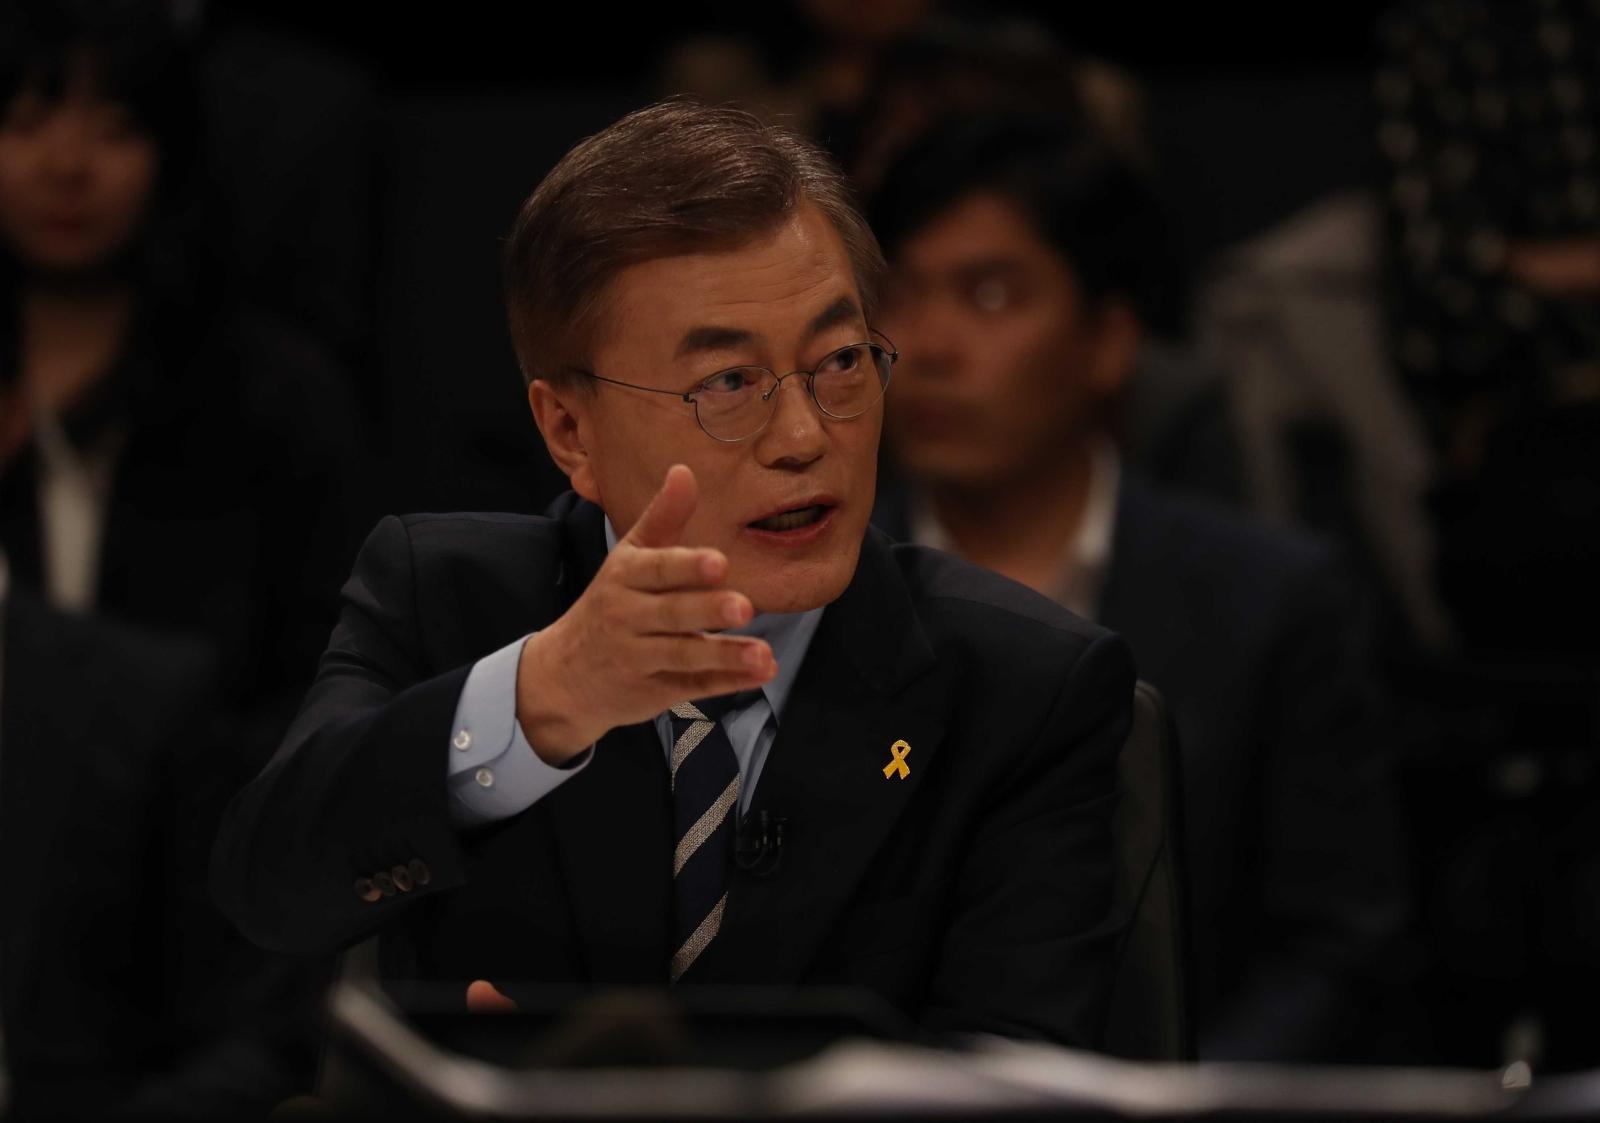 JTBC(중앙일보 ·한국정치학회 공동 주관)가 주최하는 대선후보 토론회가 25일 일산 빛마루 방송지원센터에서 열렸다.문재인 대선후보가 발언하고 있다. 오종택 기자